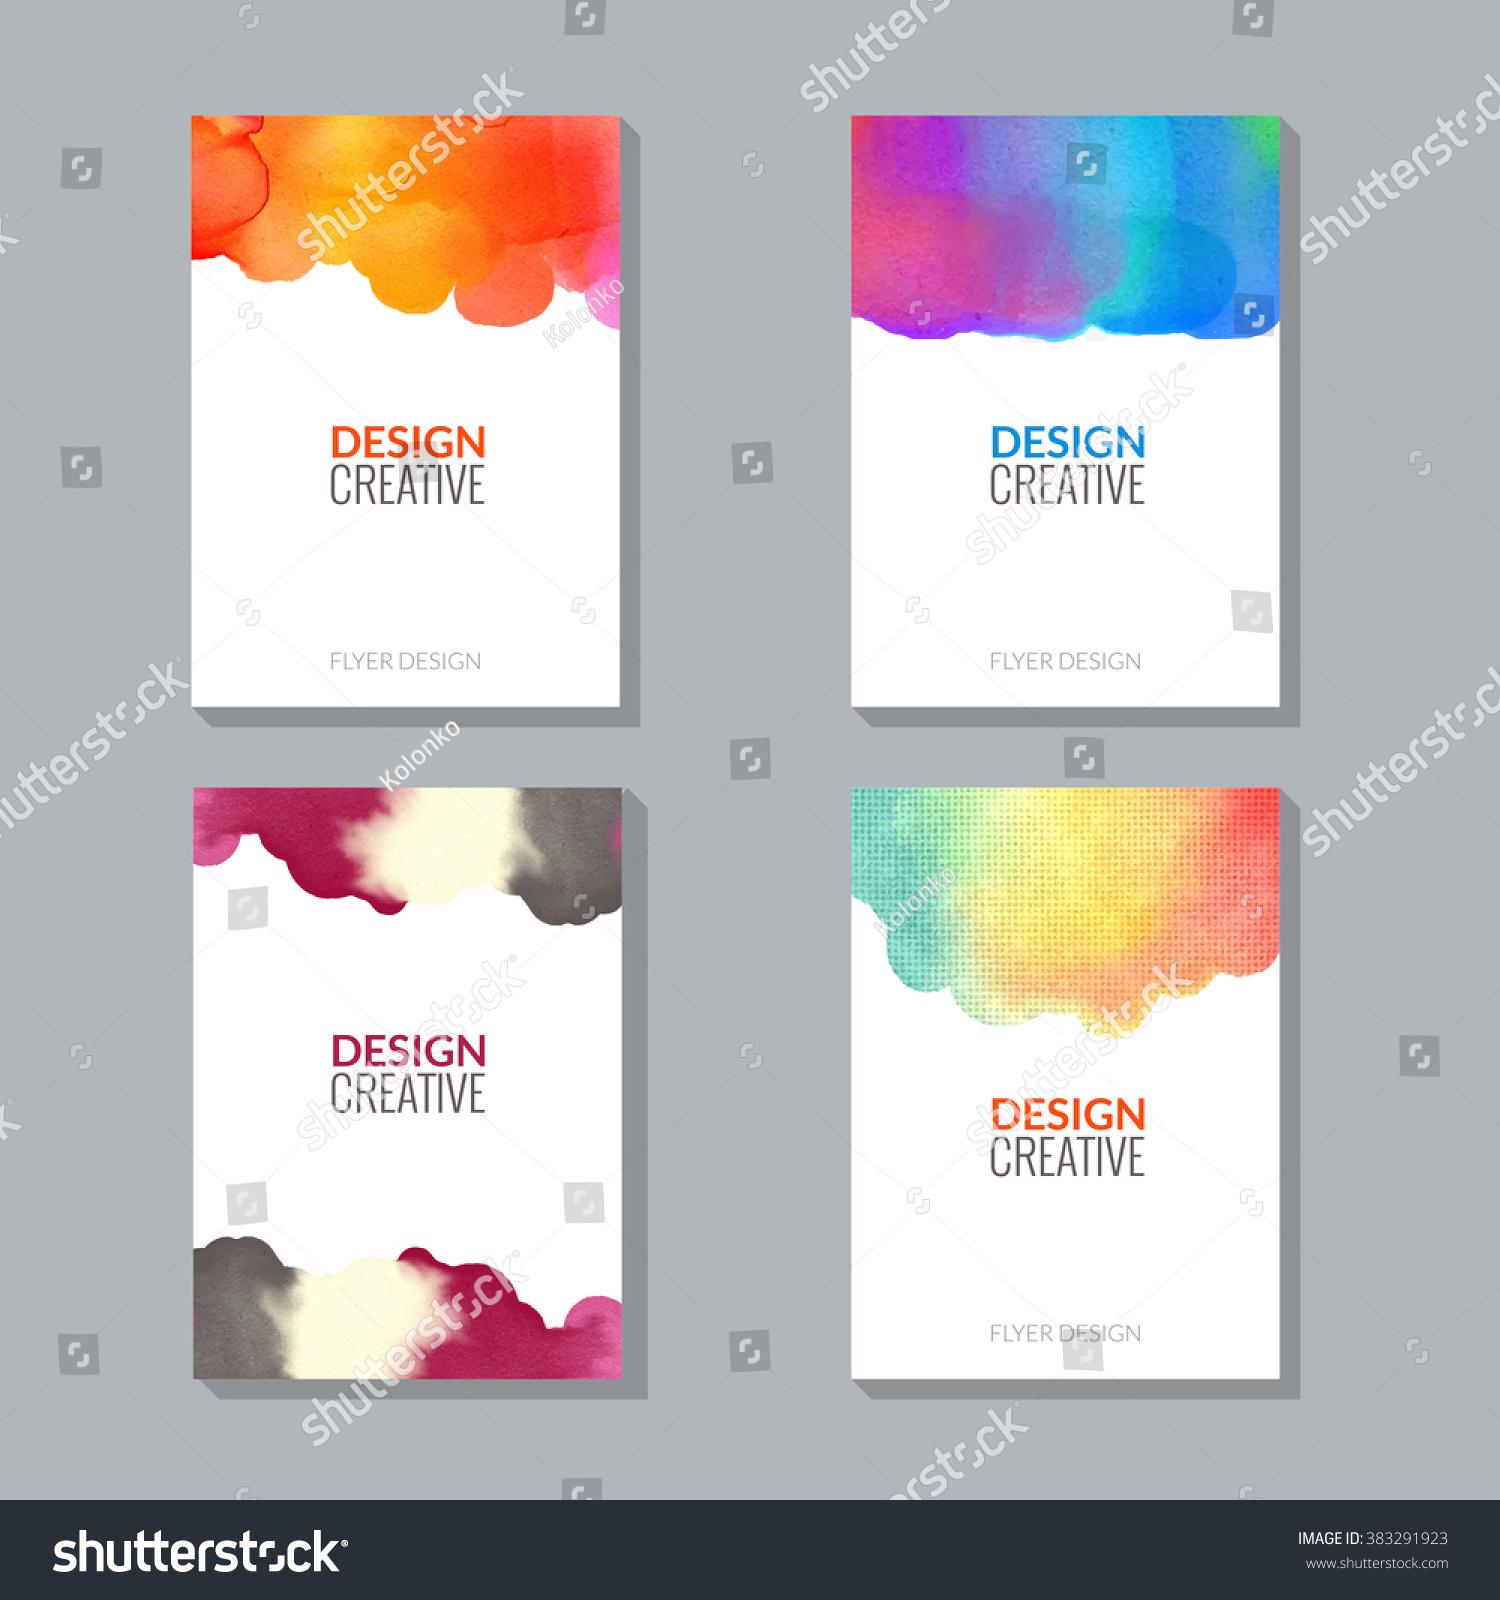 Vector Poster Flyer Templates Watercolor Paint Stock Vector ...